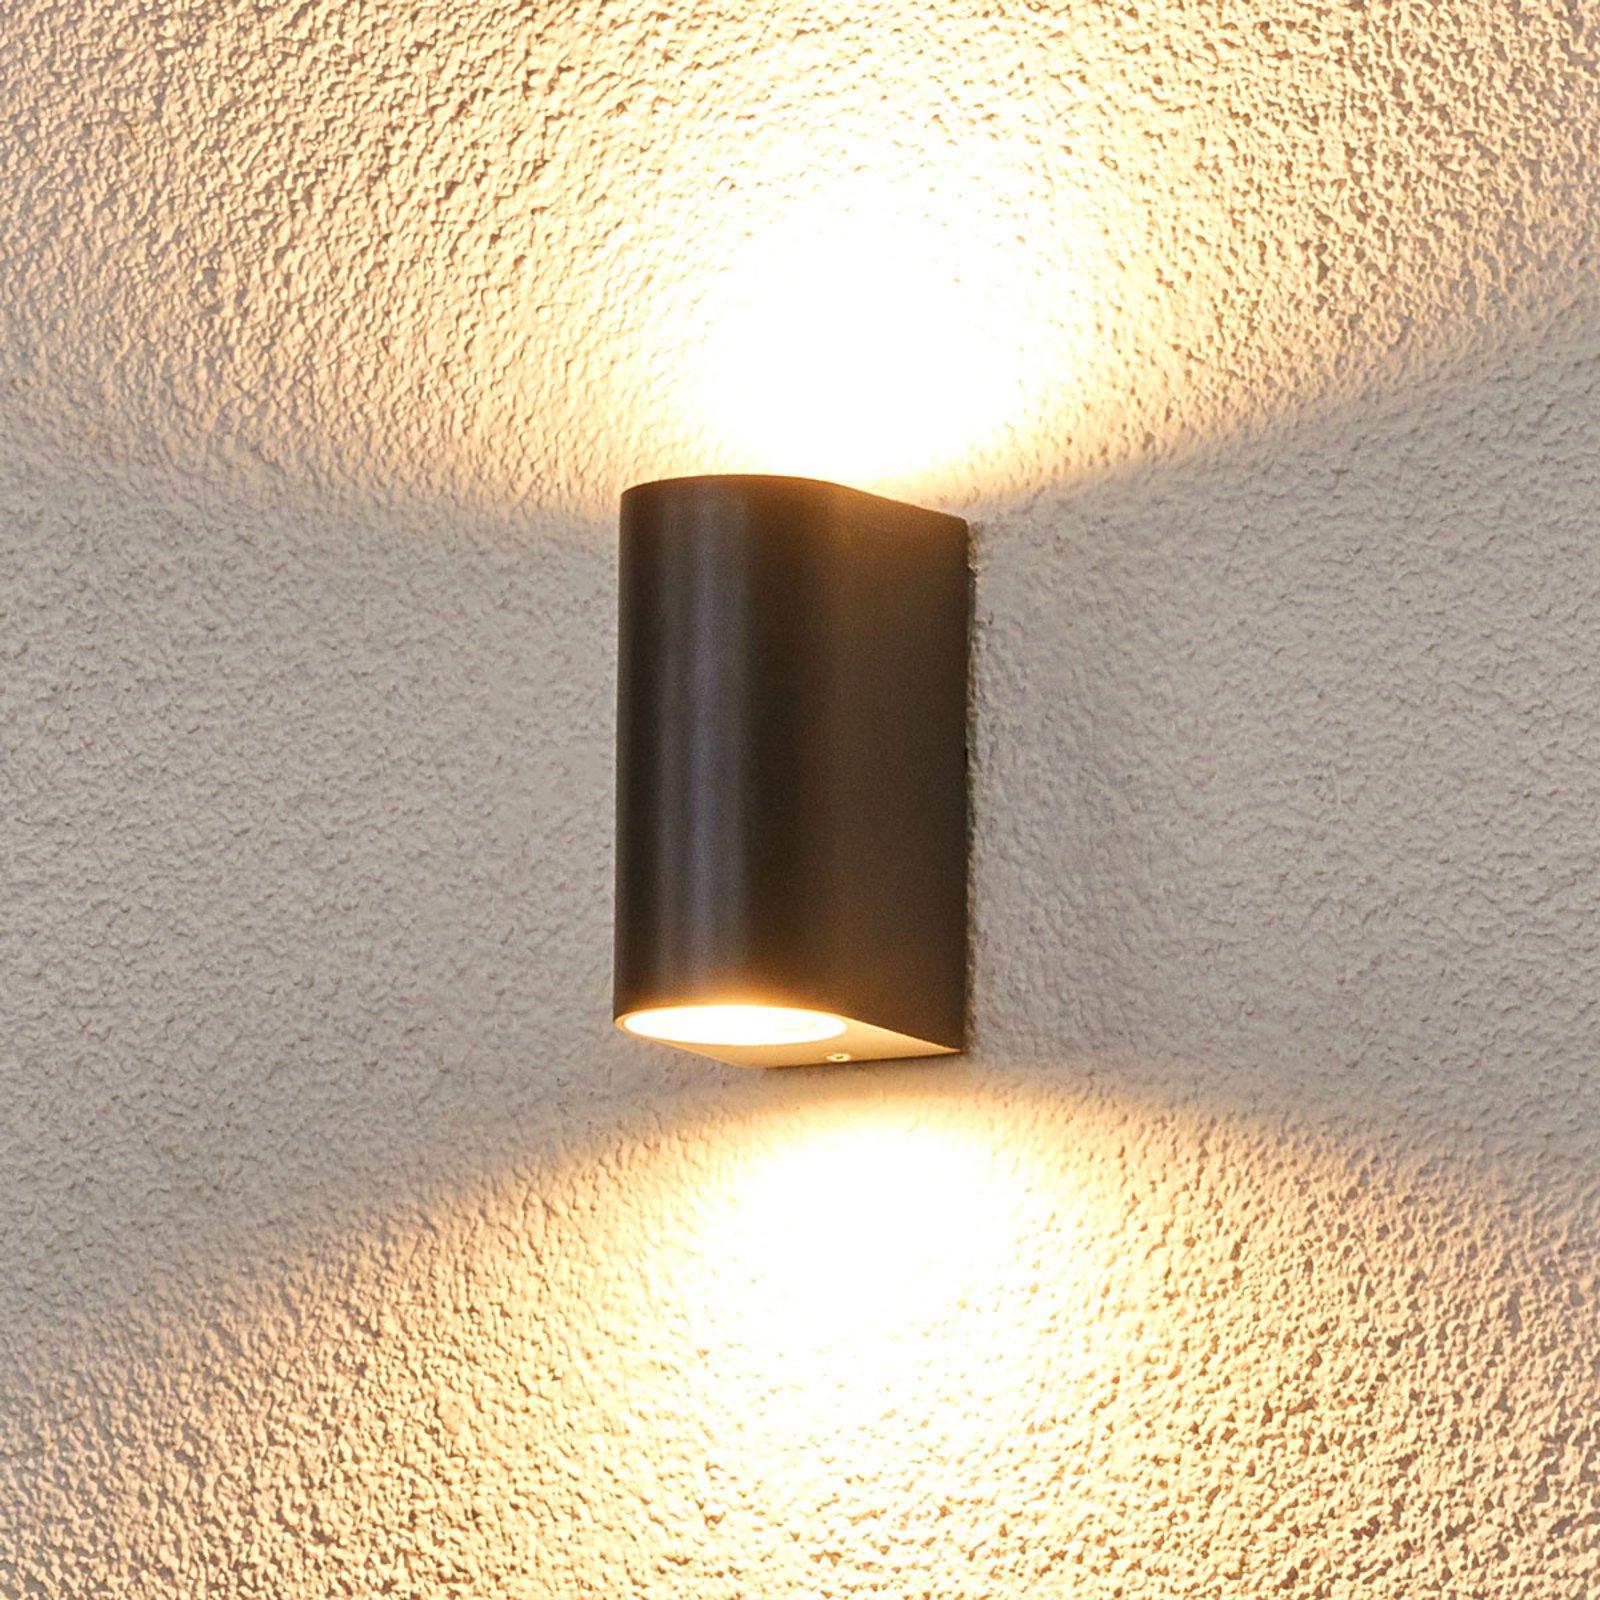 Utevegglampe Palina med tosidig belysning